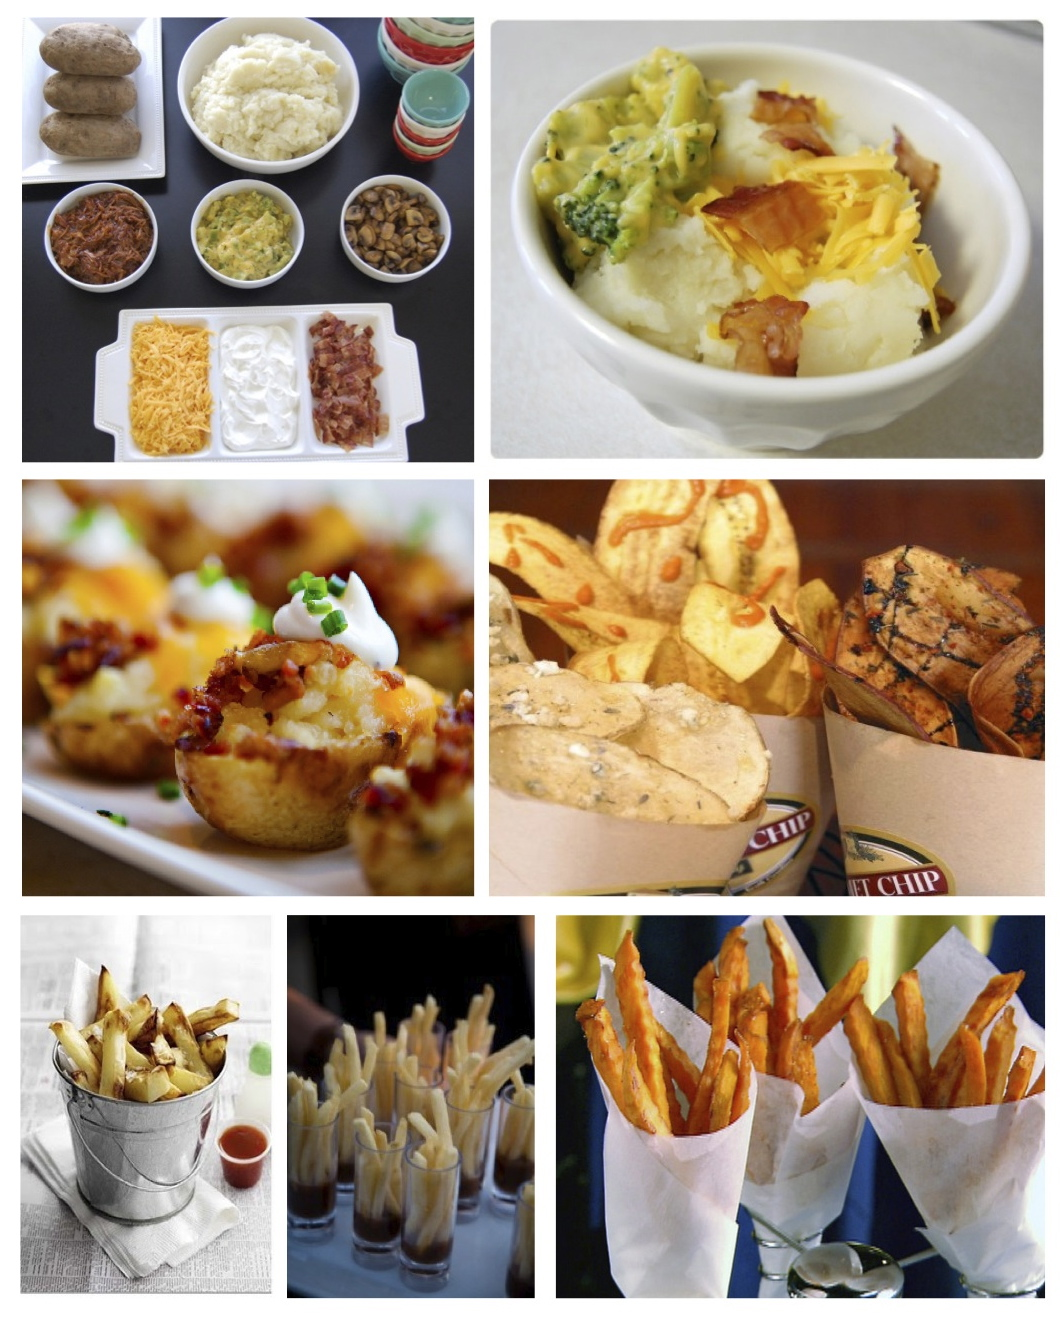 http://1.bp.blogspot.com/-ez7rmdXfzk4/UA7bRBedtoI/AAAAAAAAAec/6k_wrZh77y0/s1600/Potato%2BIdeas.jpg